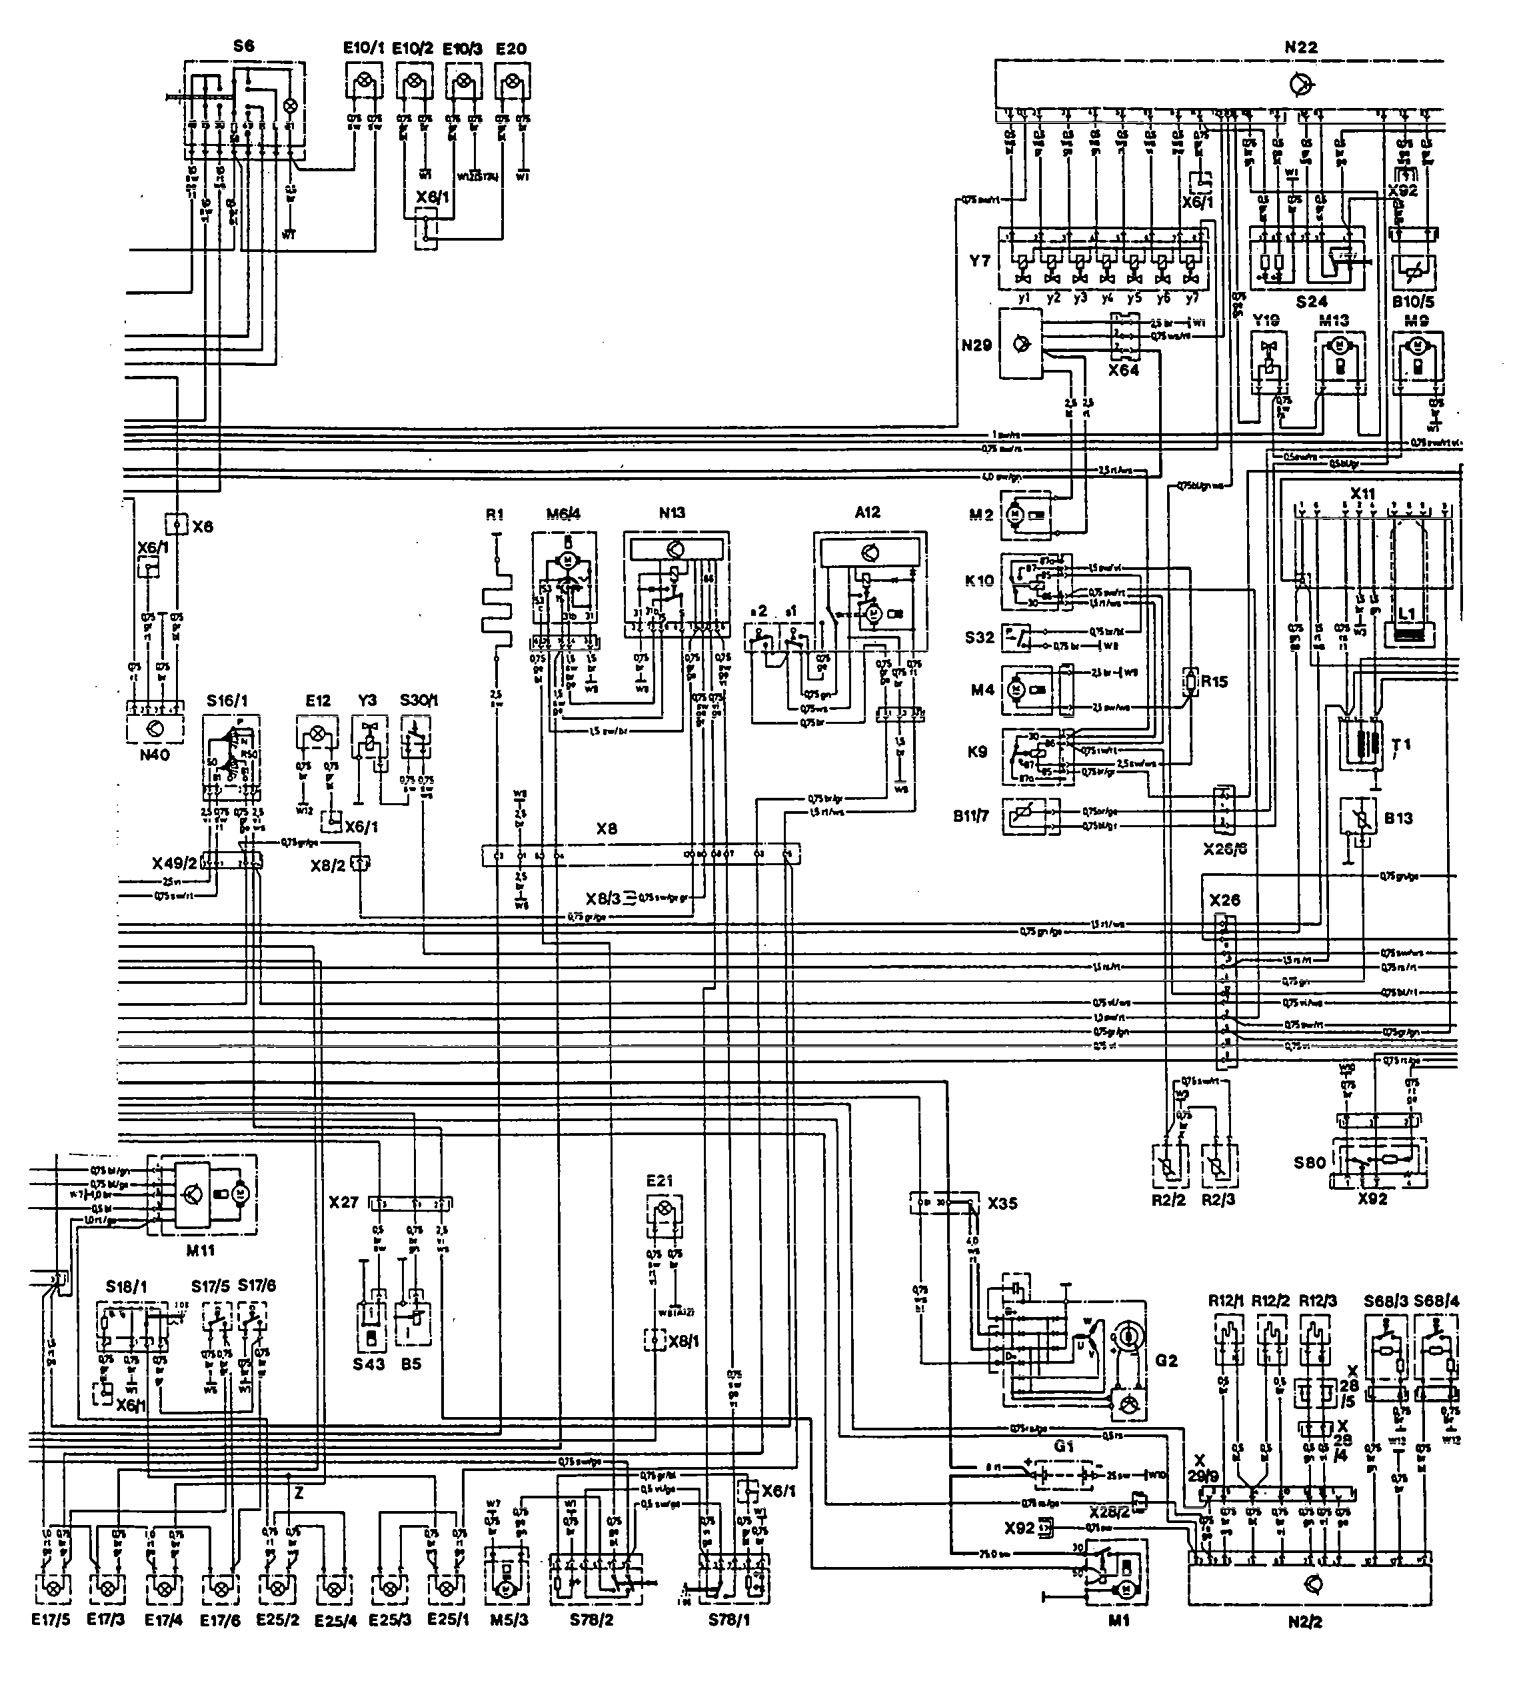 Bmw Wd 120 Wiring Diagram System Electrical Diagram